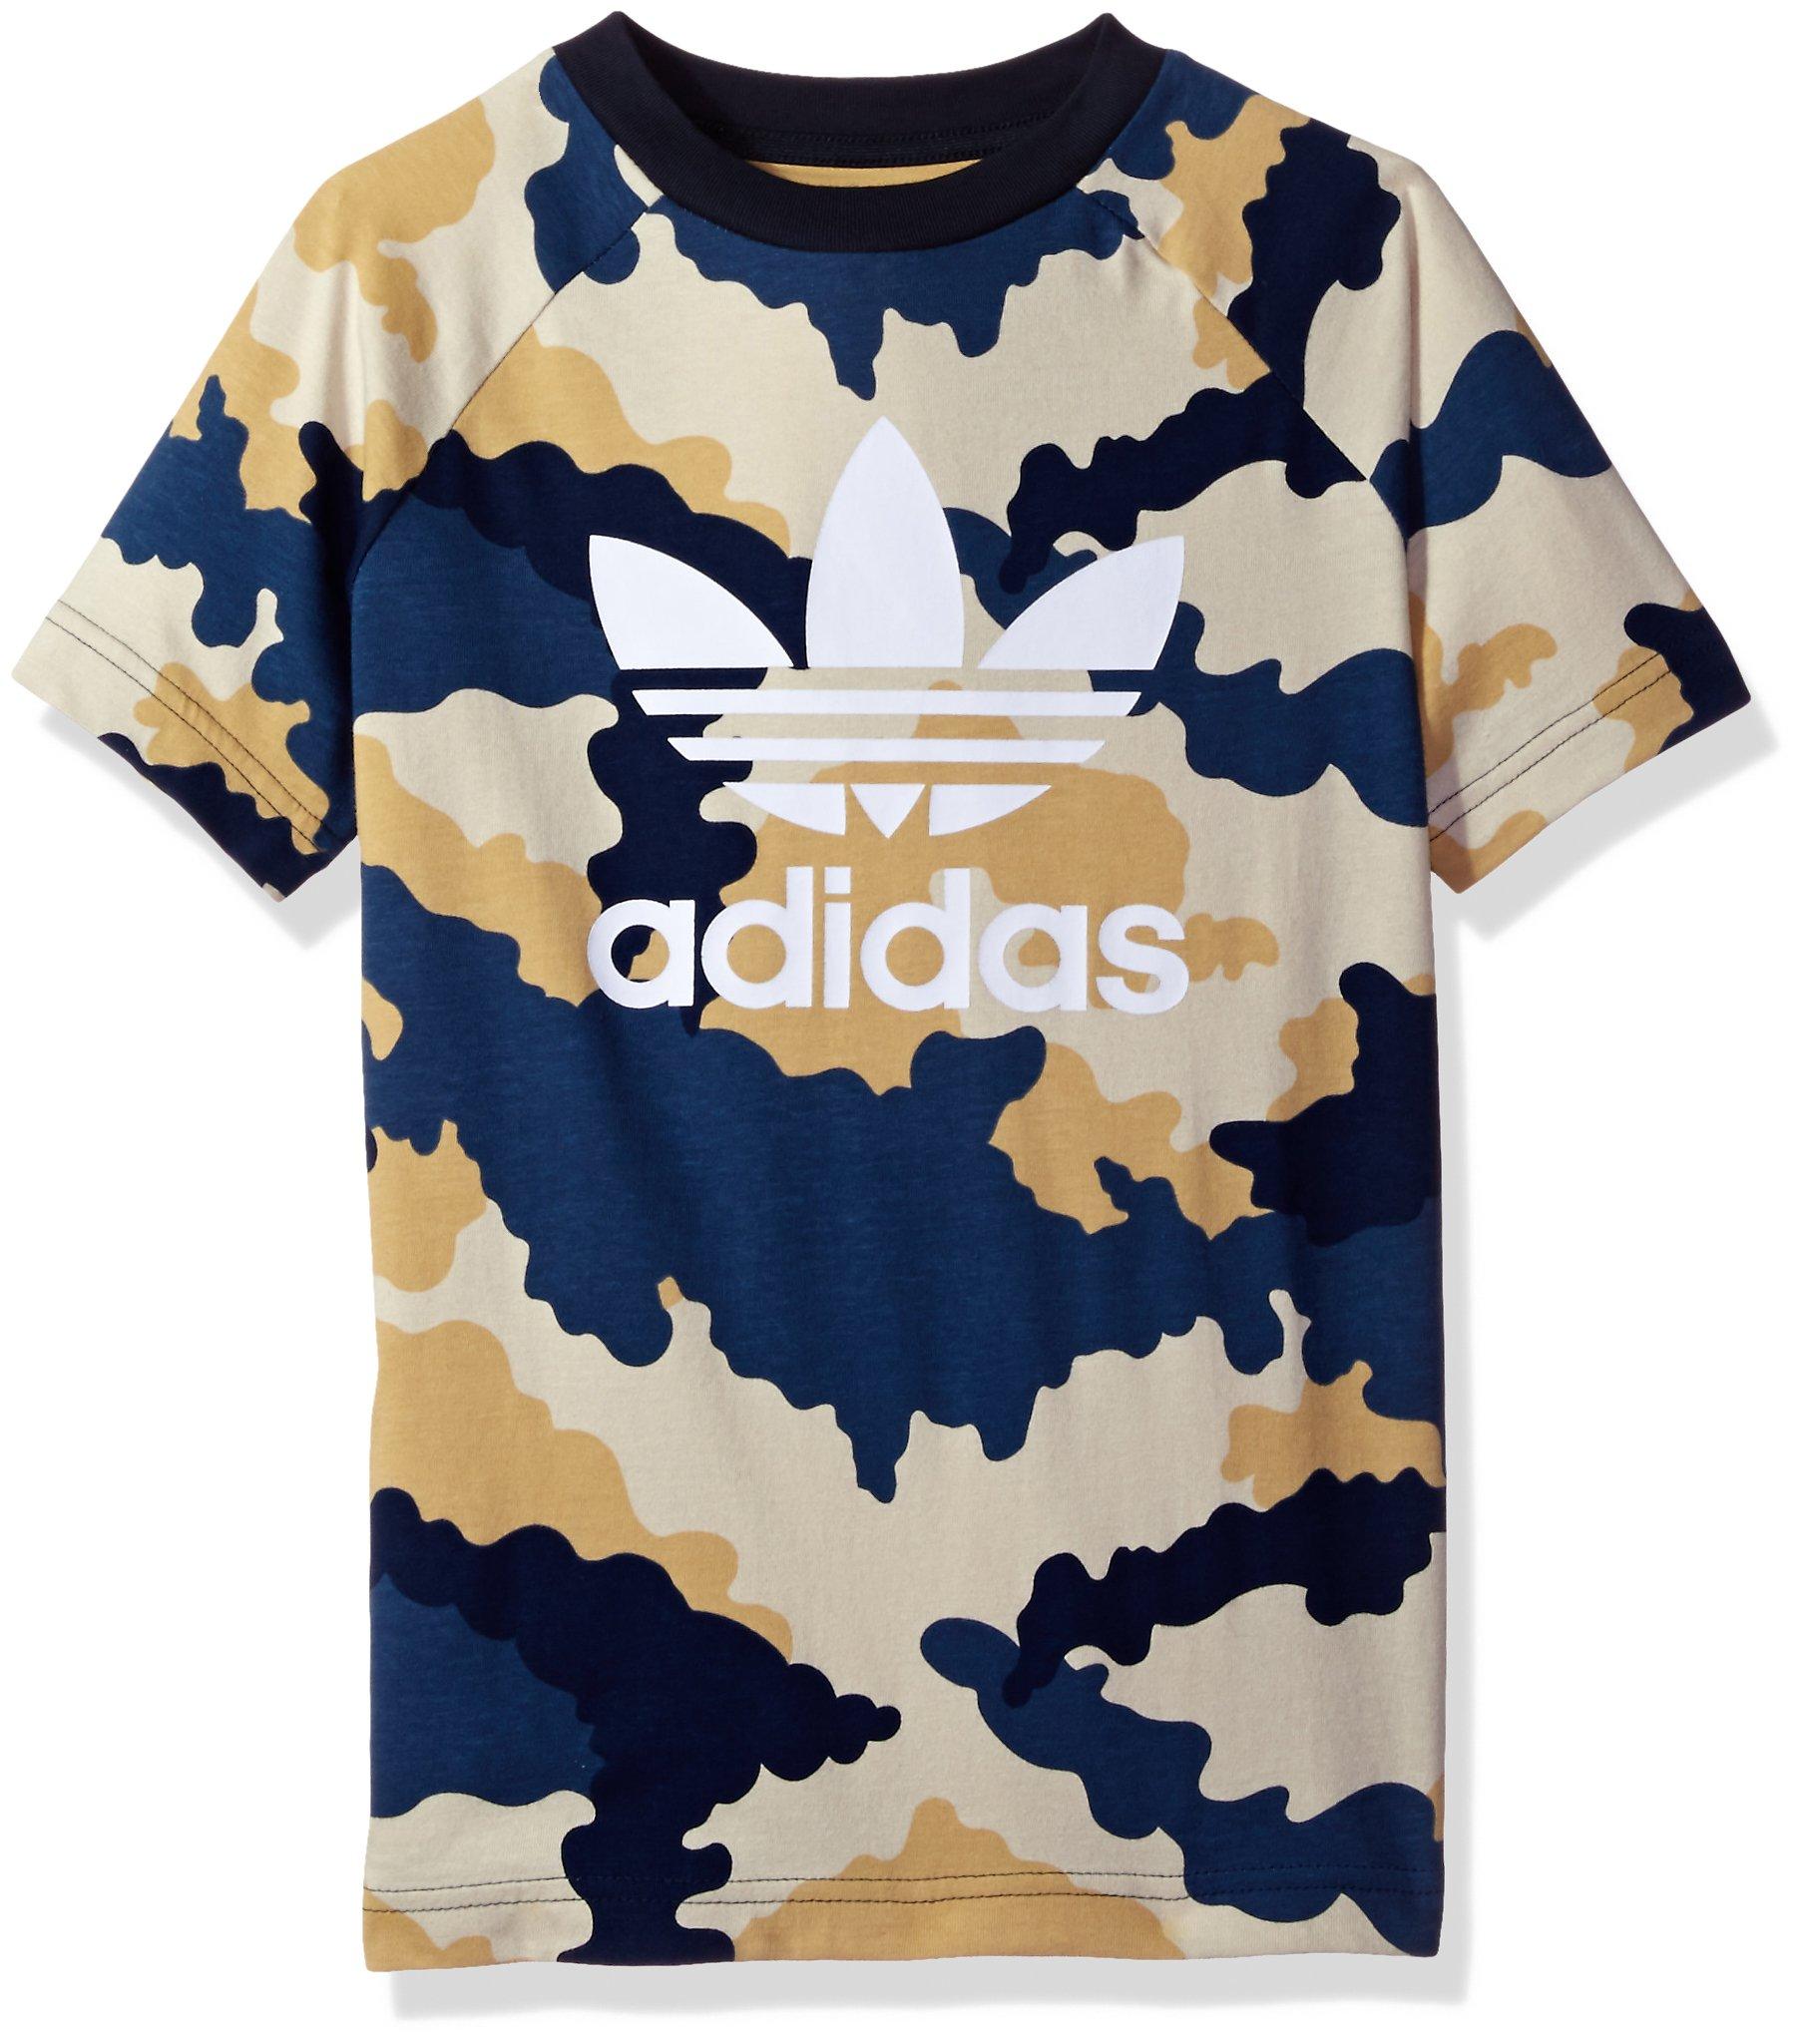 893faaf7 Galleon - Adidas Originals Tops Big Boys' Trefoil Tee, Tokyo Camo/Blue/Tan/White,  Small